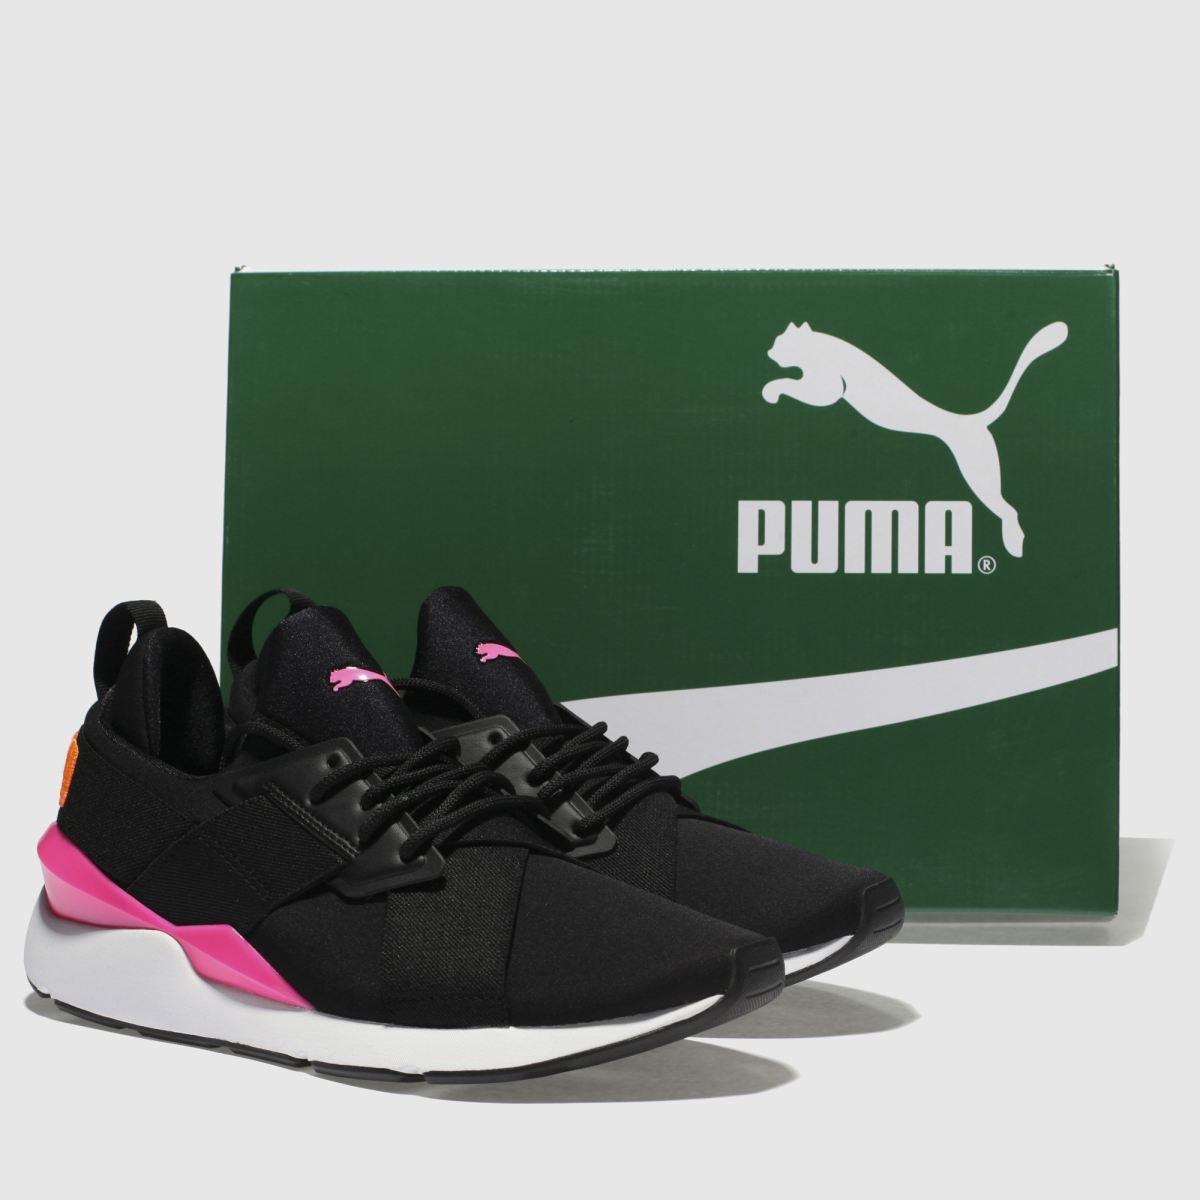 Damen Schwarz-pink puma Muse Gute Chase Sneaker | schuh Gute Muse Qualität beliebte Schuhe e45028